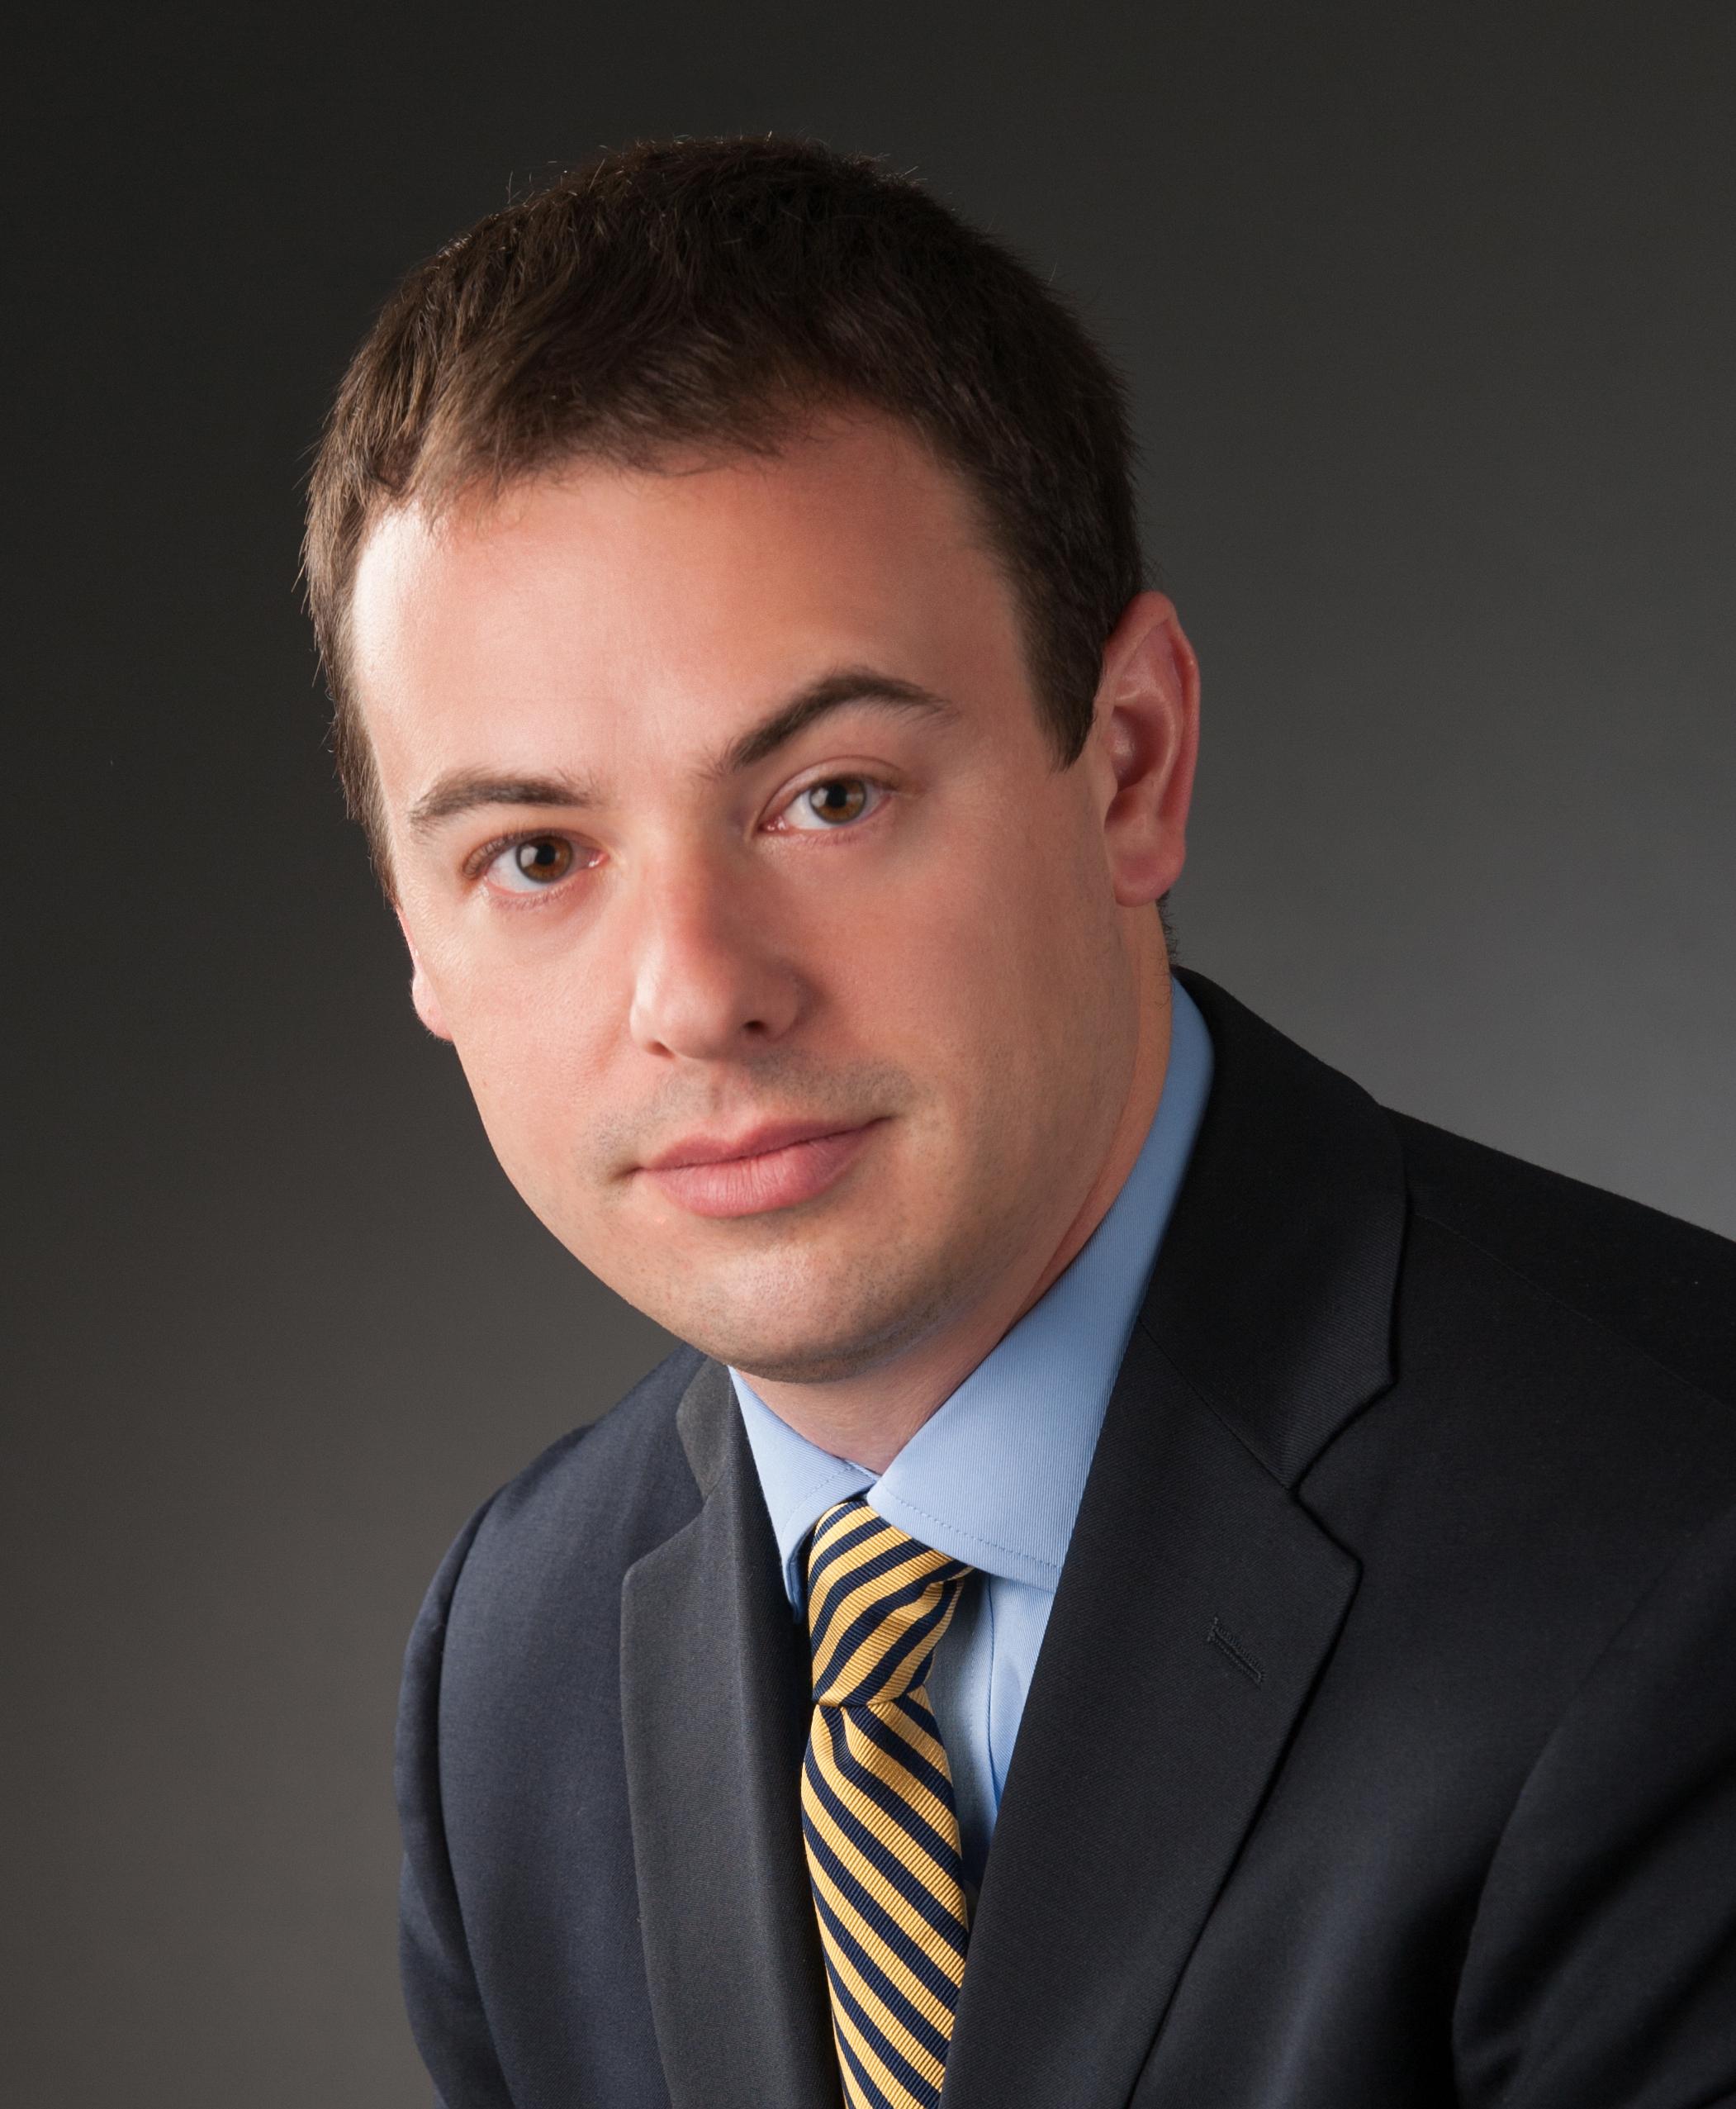 David Anderrson